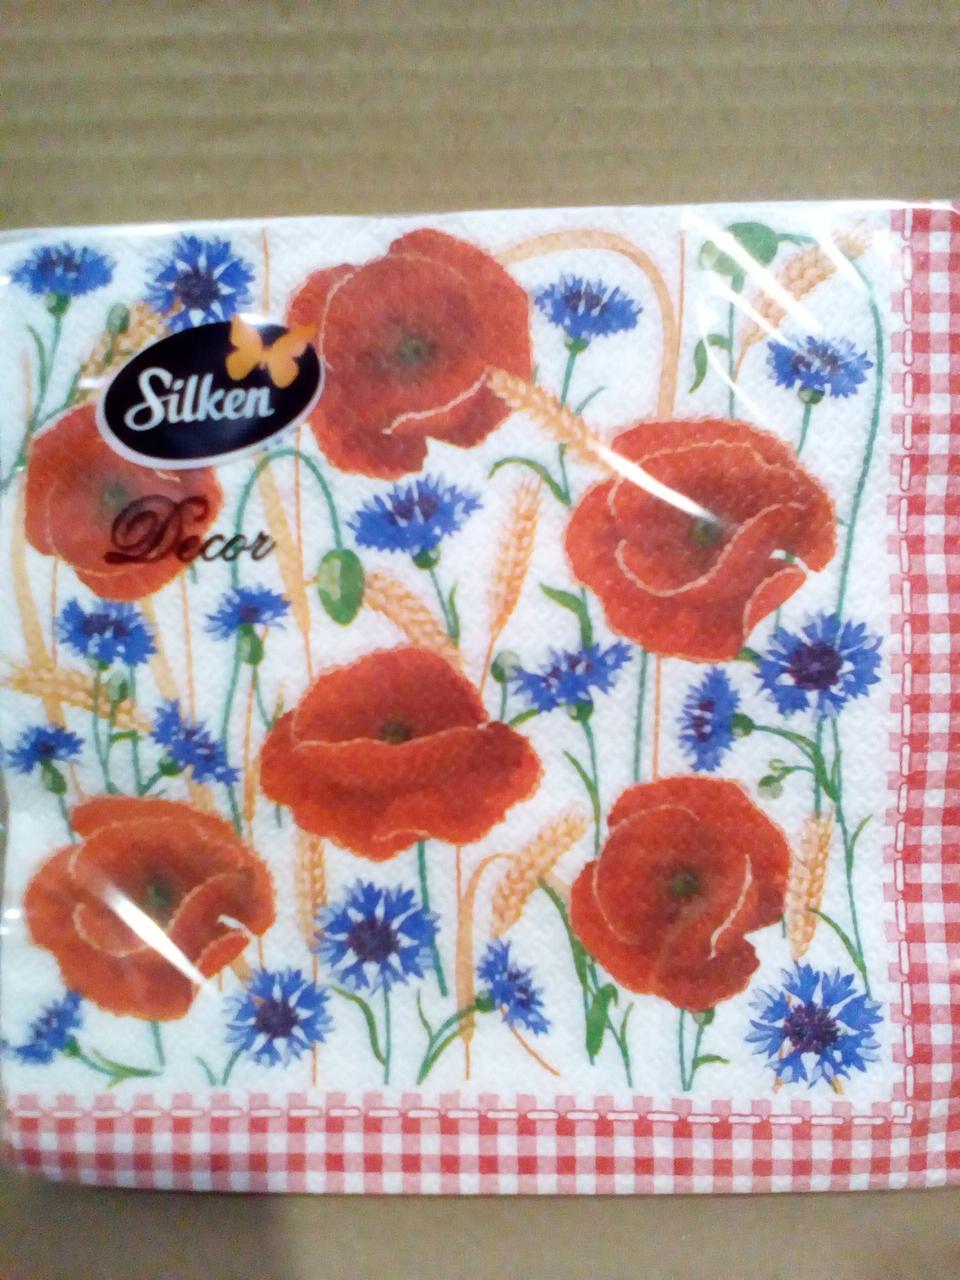 "Серветка Silken 3-шарова ""Маки"" з печаткою 20шт 33*33см"